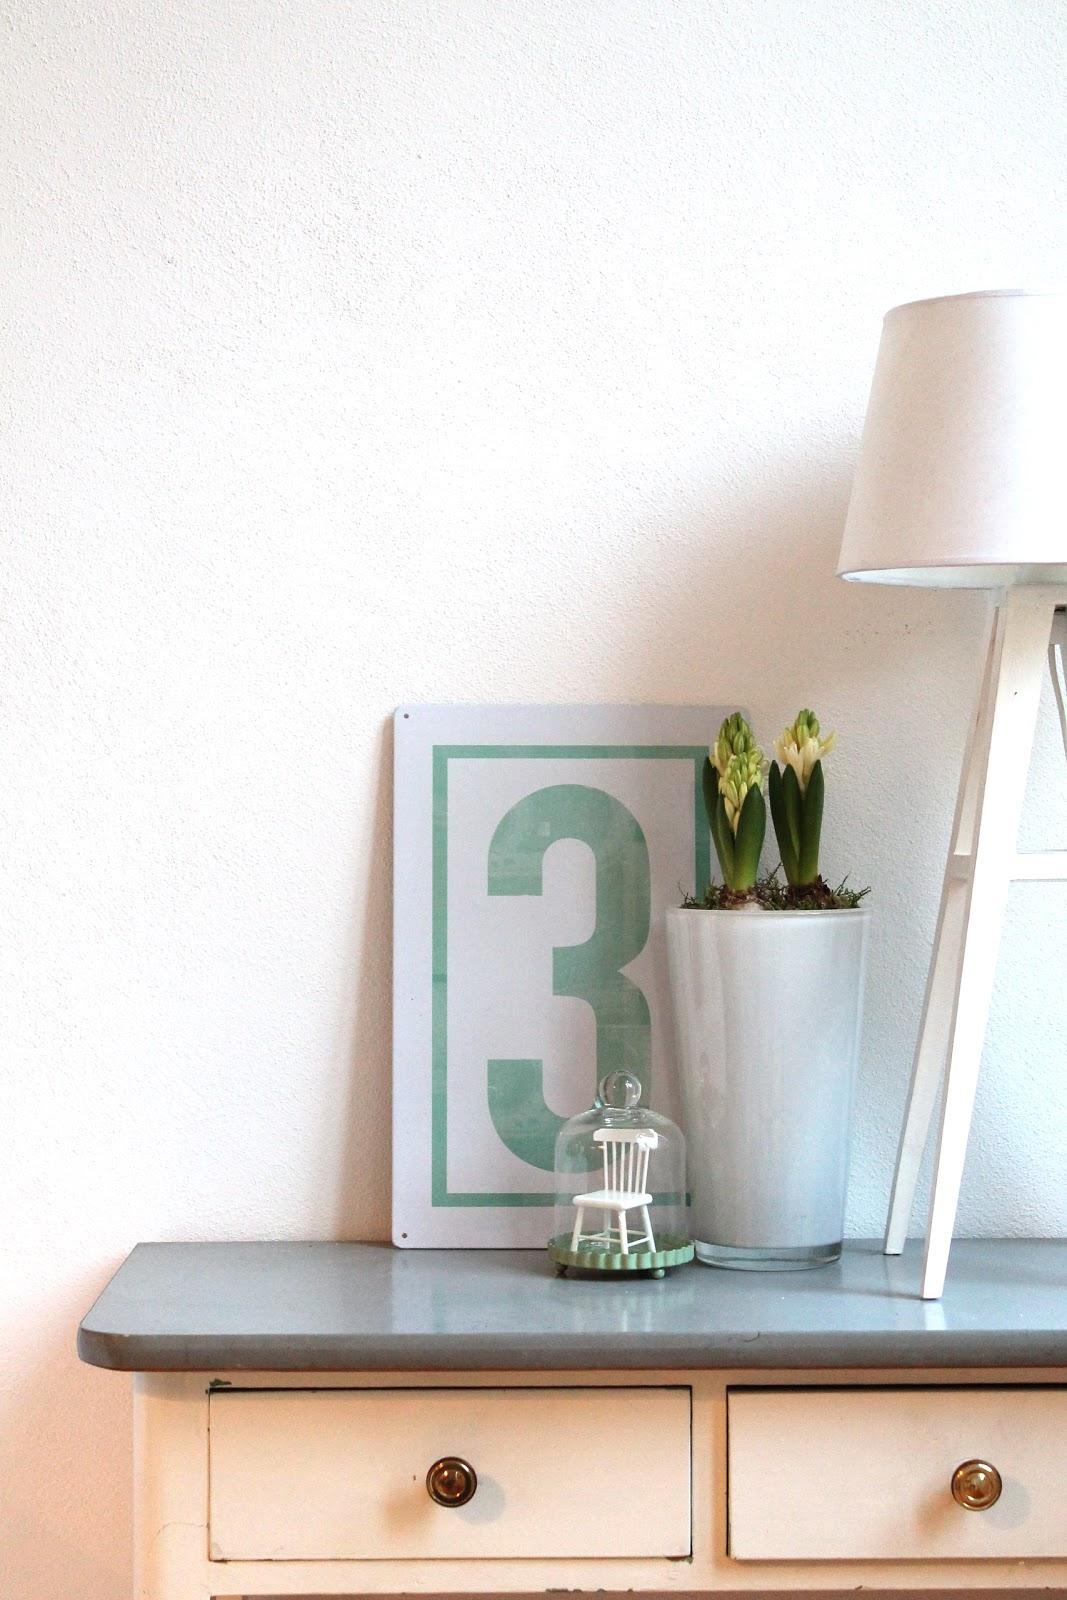 britta bloggt ich will fr hling. Black Bedroom Furniture Sets. Home Design Ideas